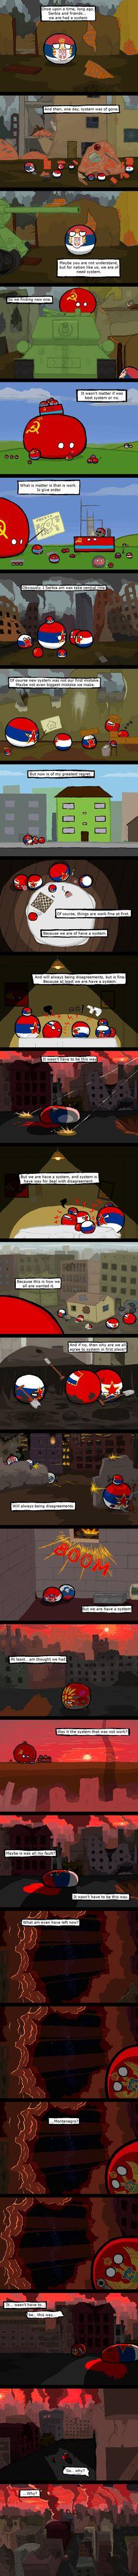 The End of Jugoslavia